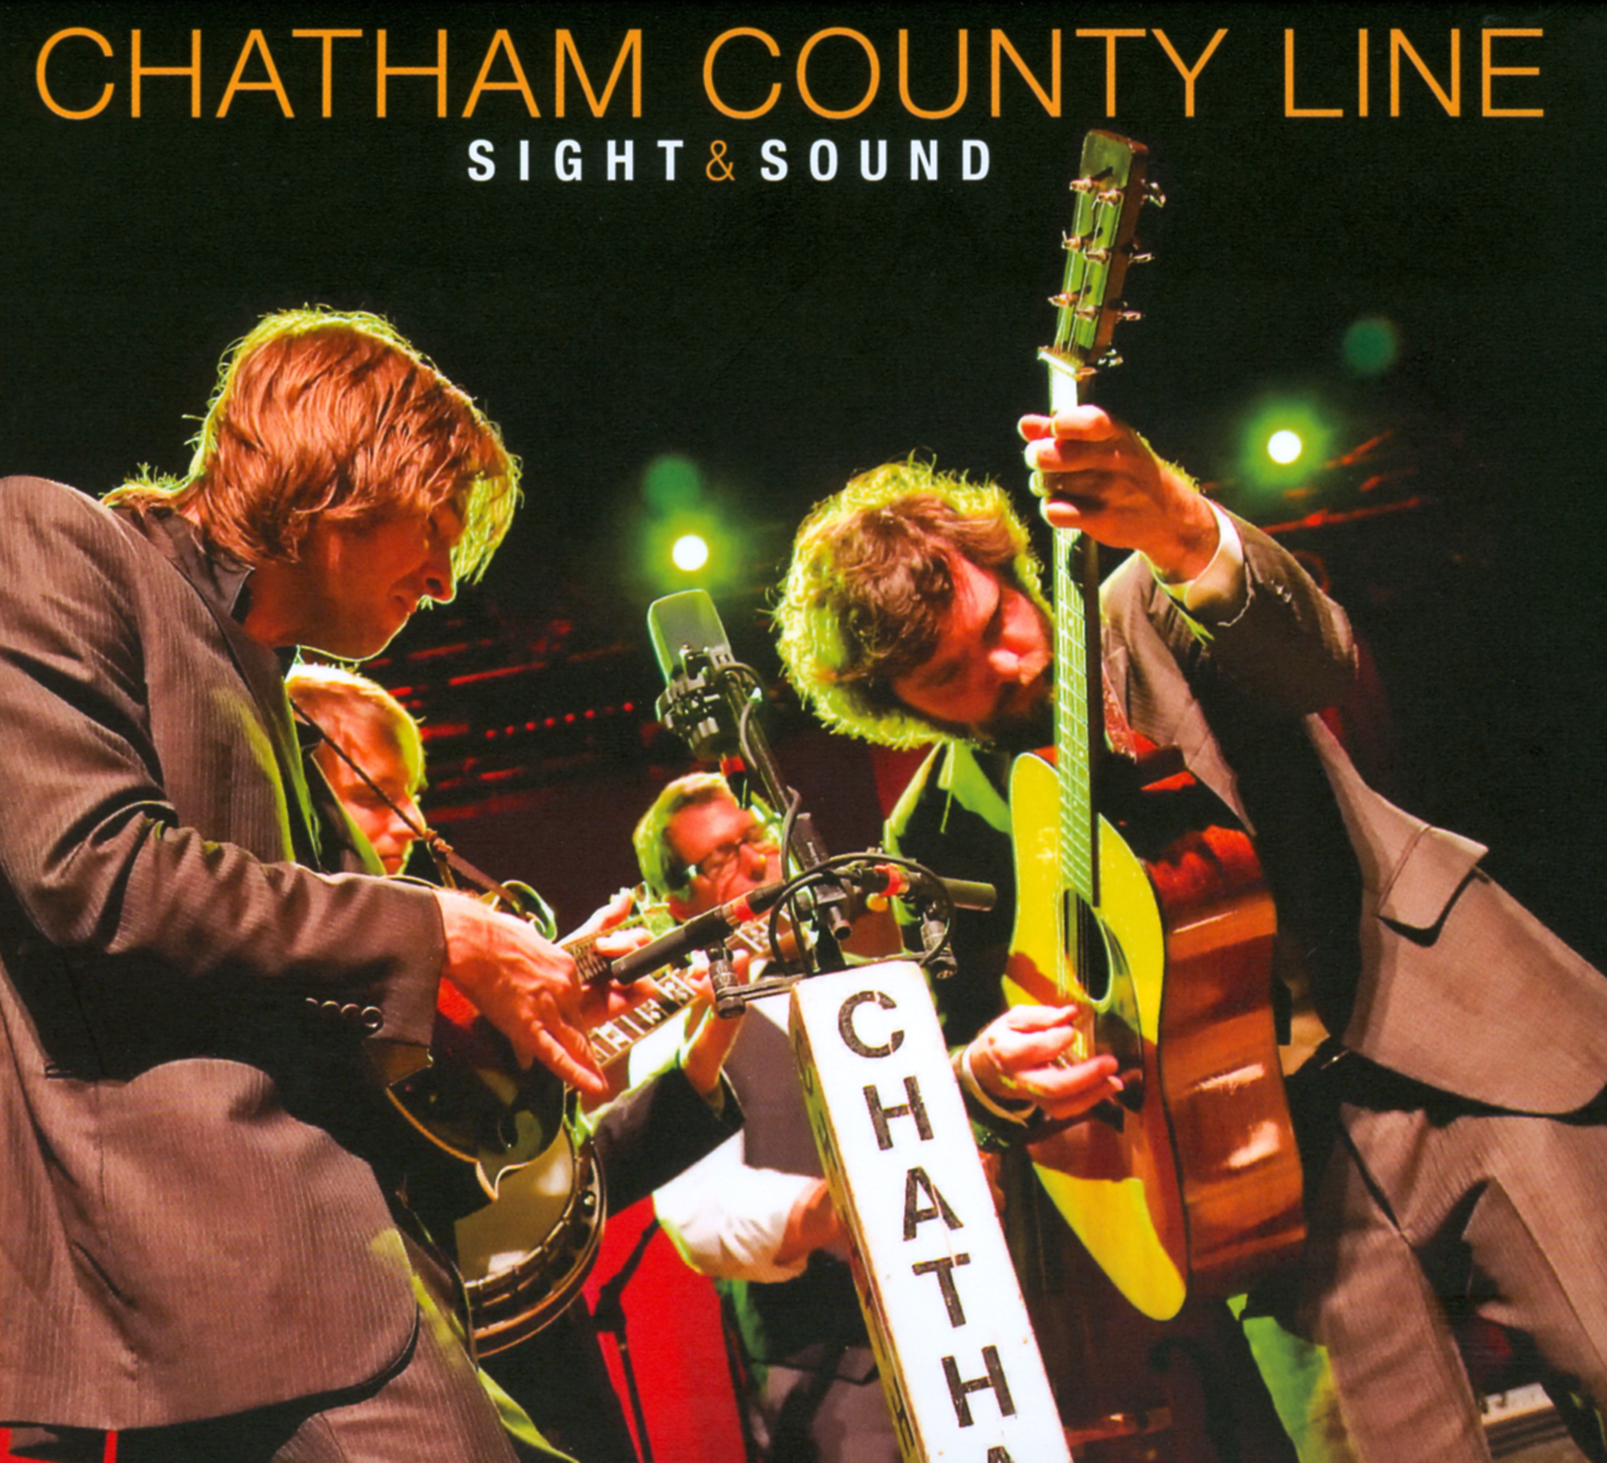 Chatham County Line: Sight & Sound